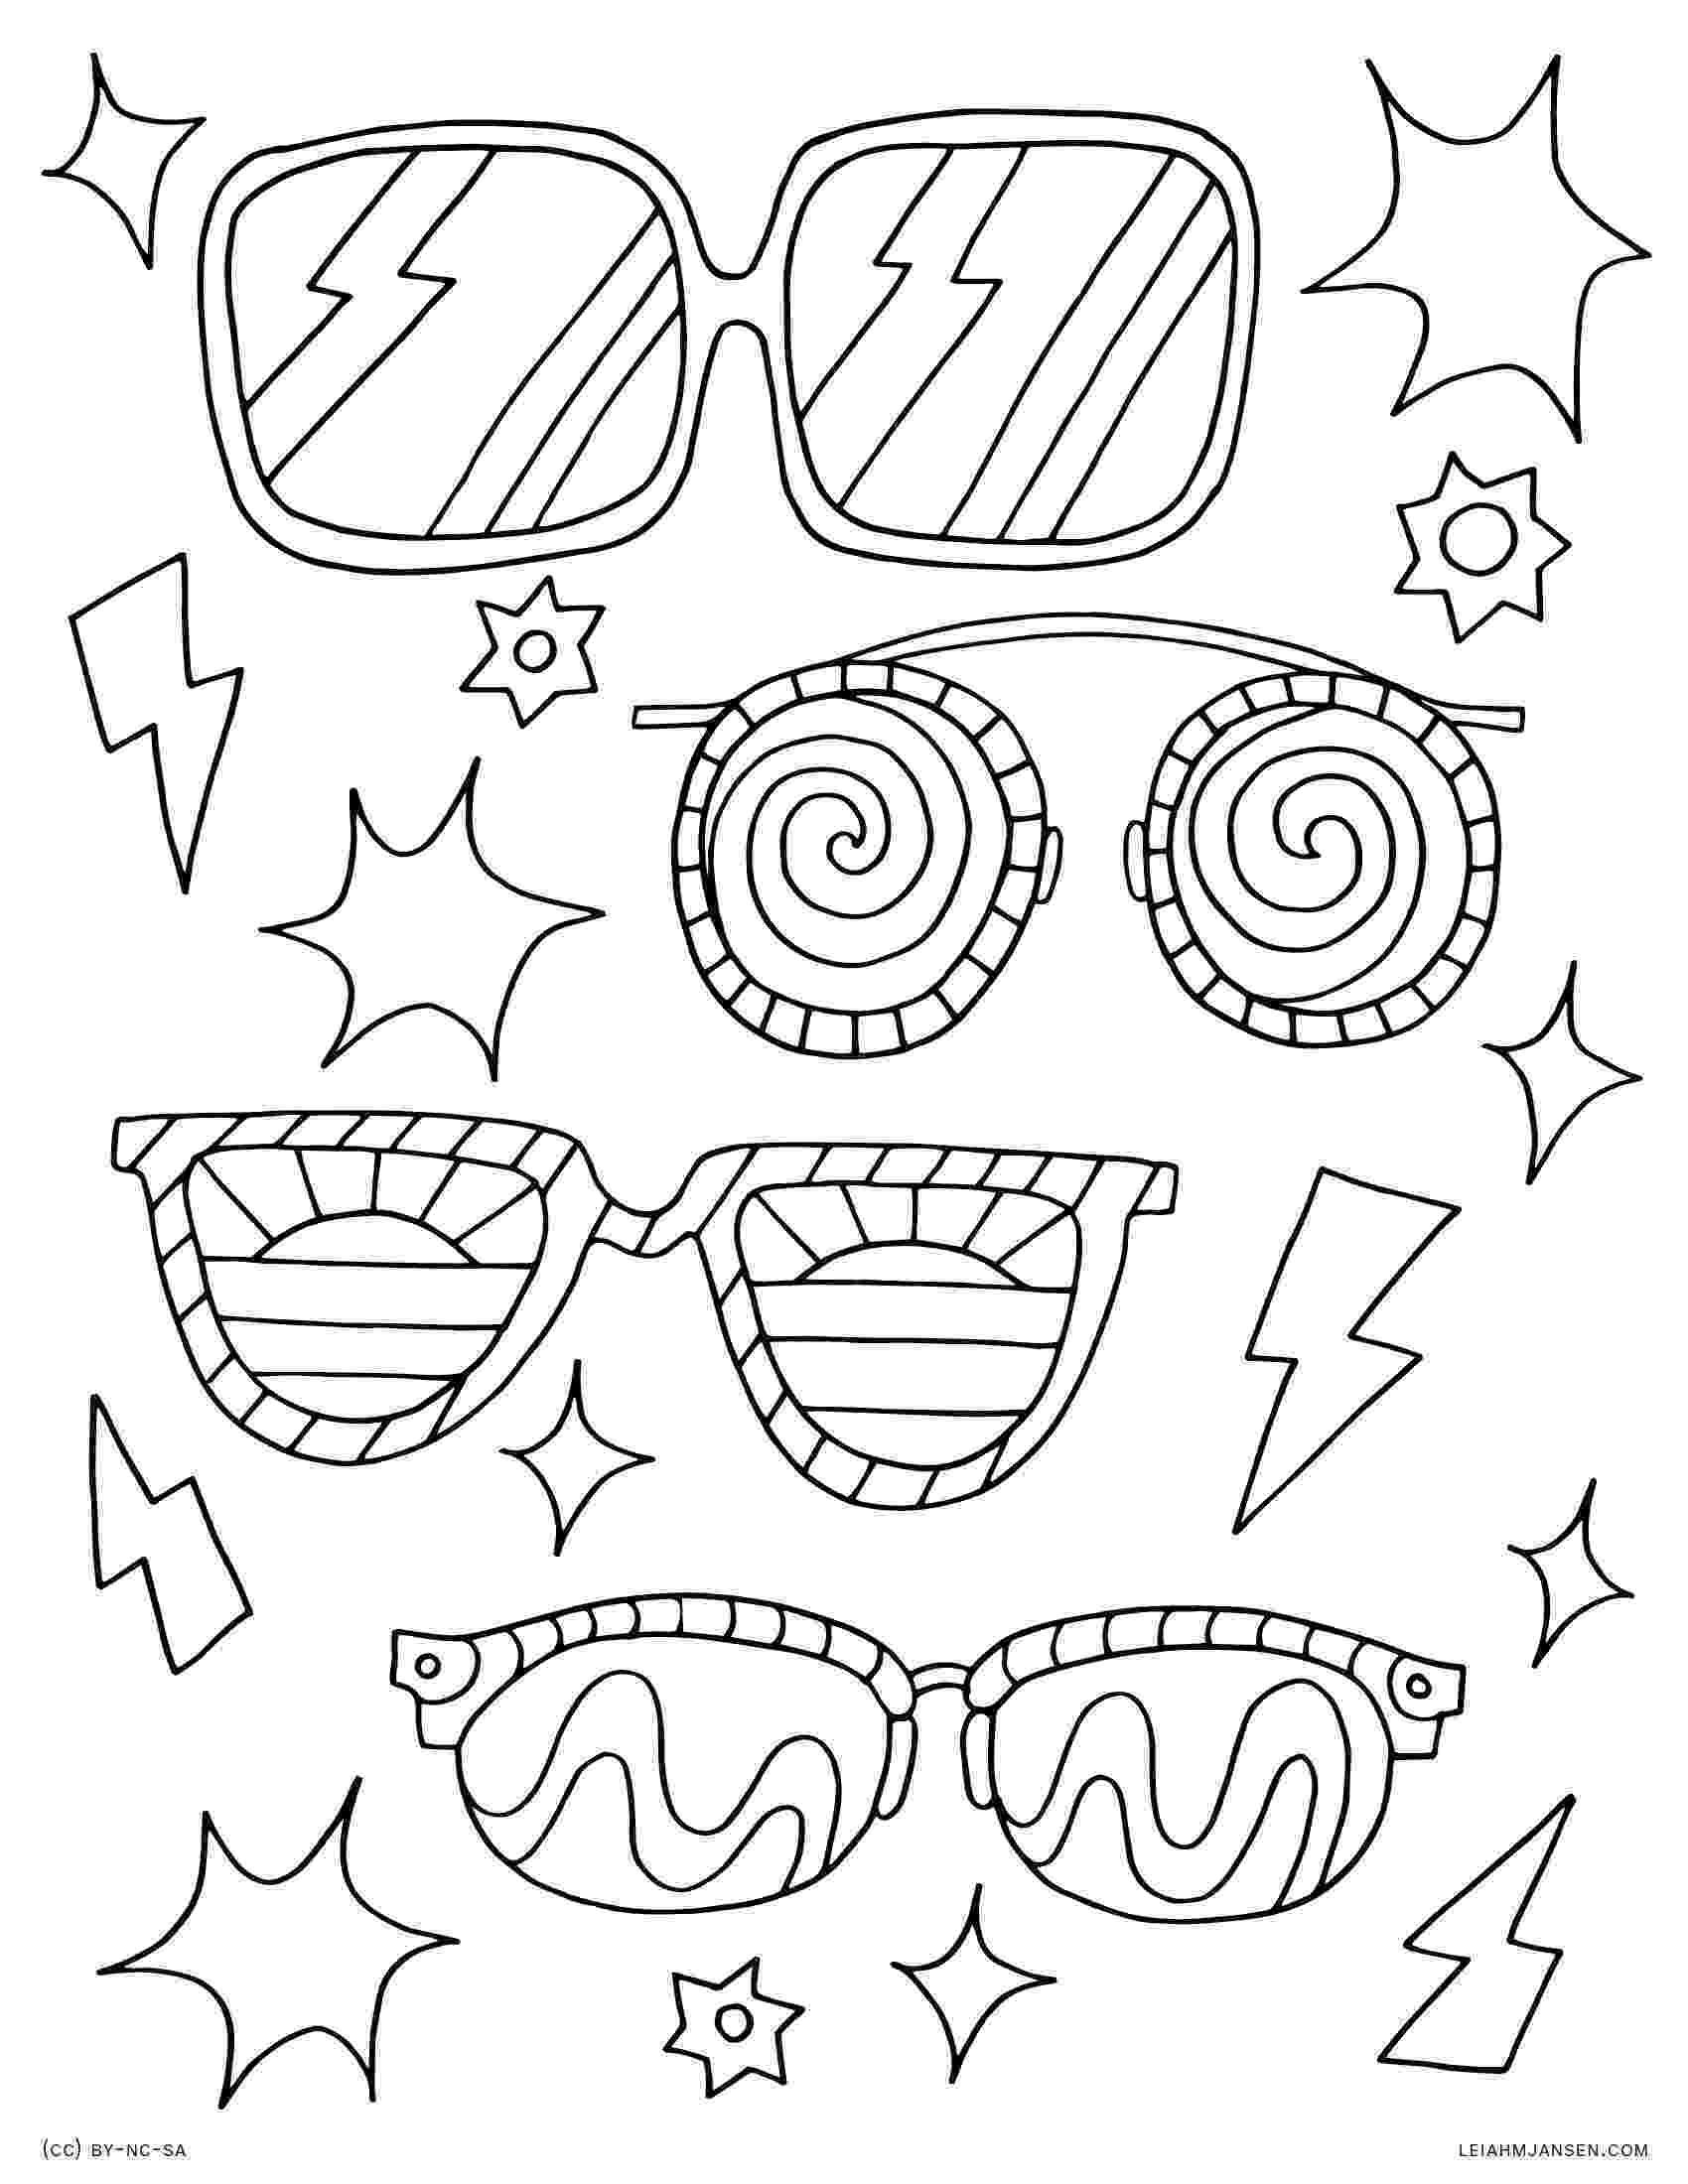 summer coloring sheets summer holiday coloring pages coloring summer sheets